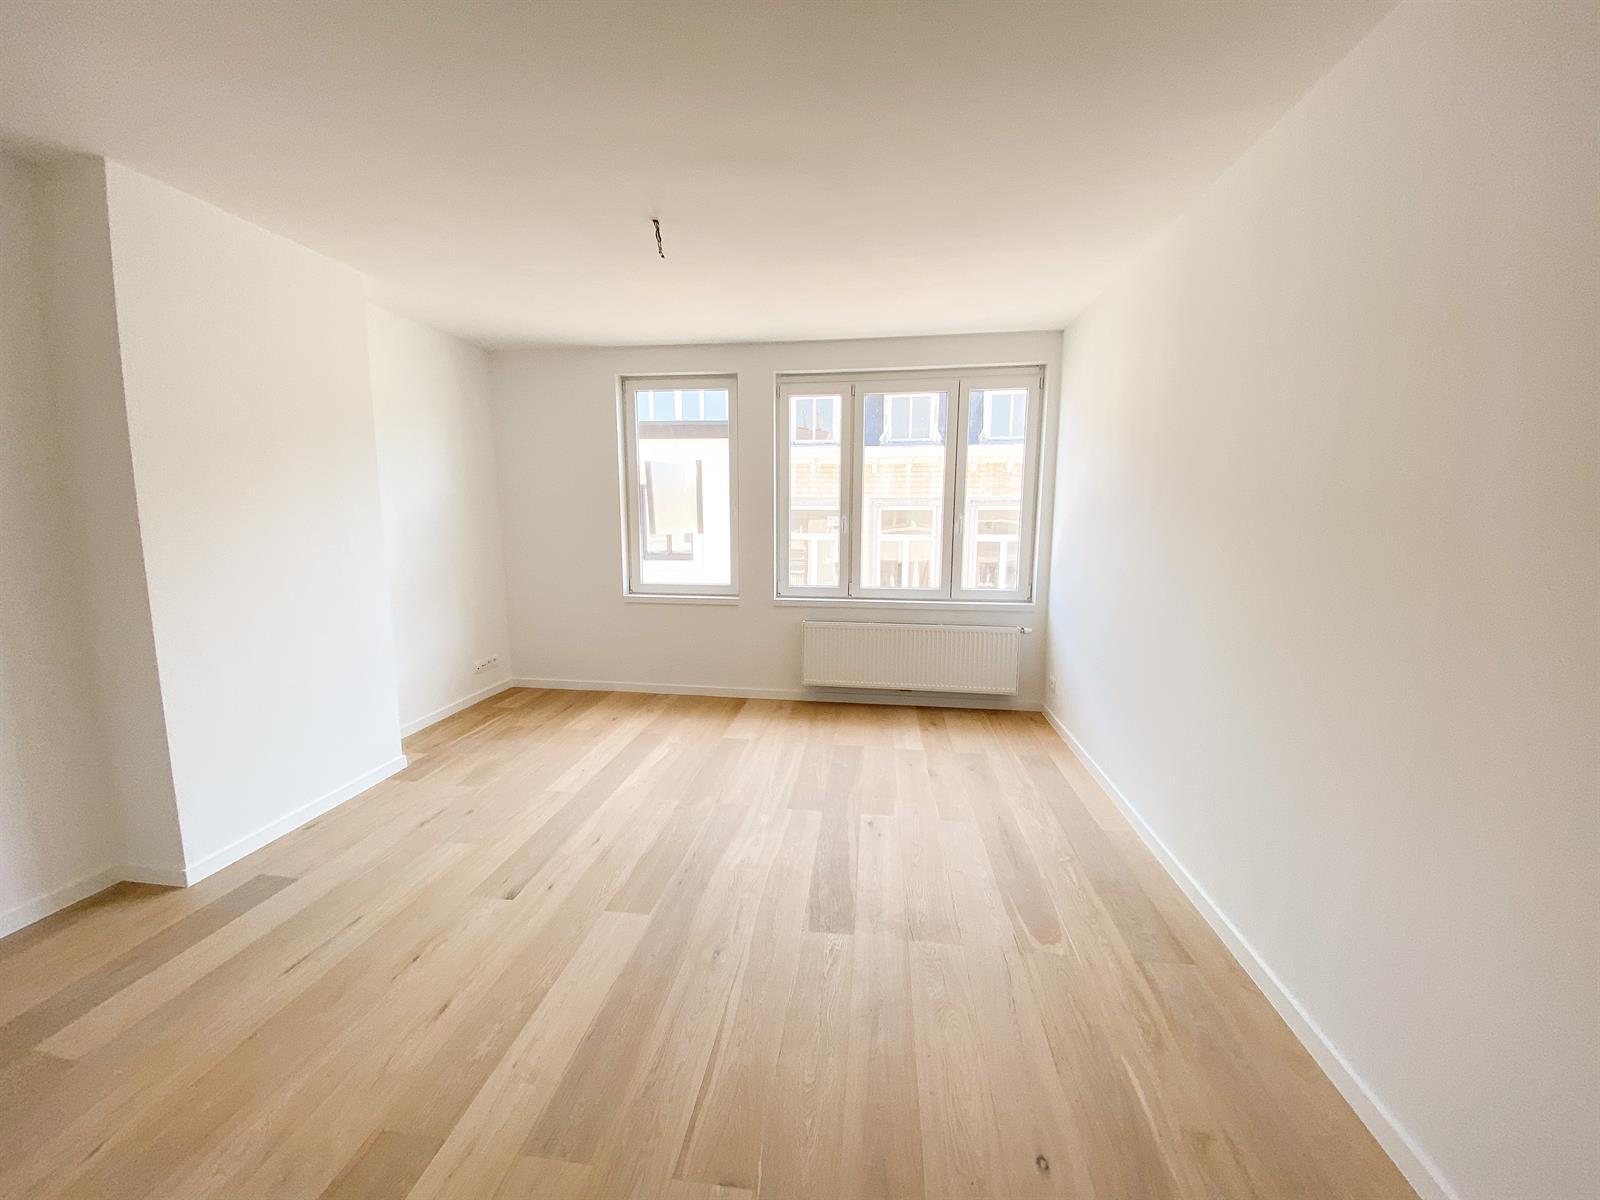 Appartement - Liège - #4045845-5